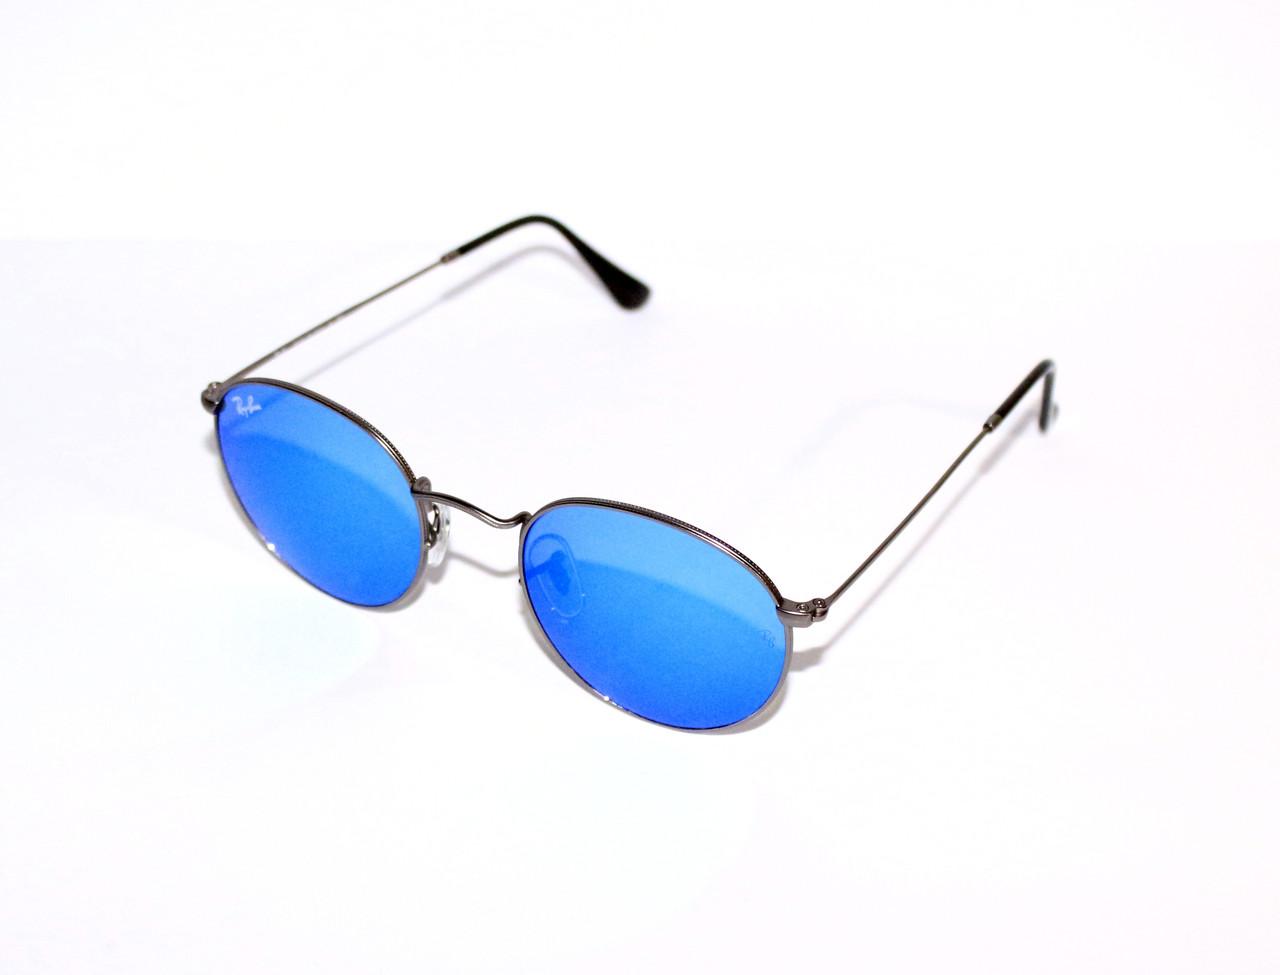 cfeba3e4dc6c Солнцезащитные очки Ray-Ban Round Metal Синие (RB 3447 029/17)